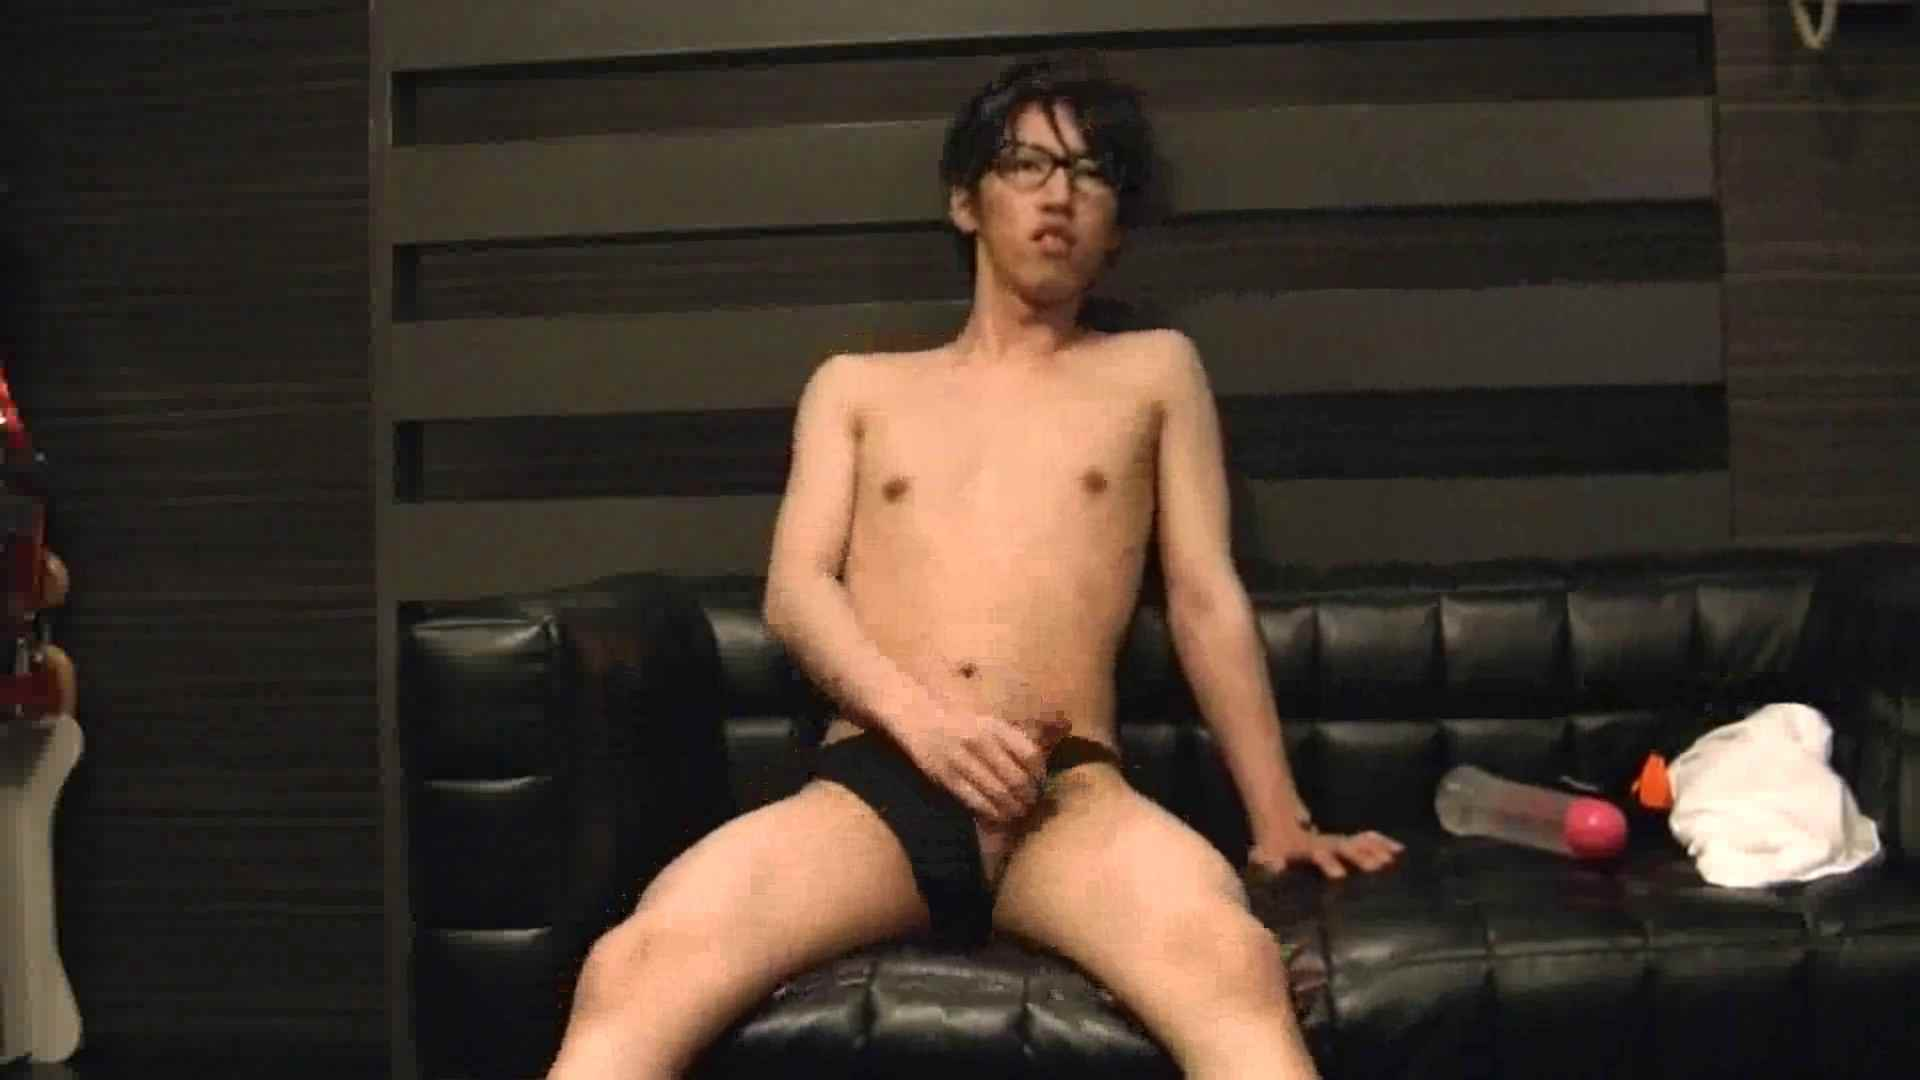 ONA見せカーニバル!! Vol3 男 ゲイ無料無修正画像 89枚 68